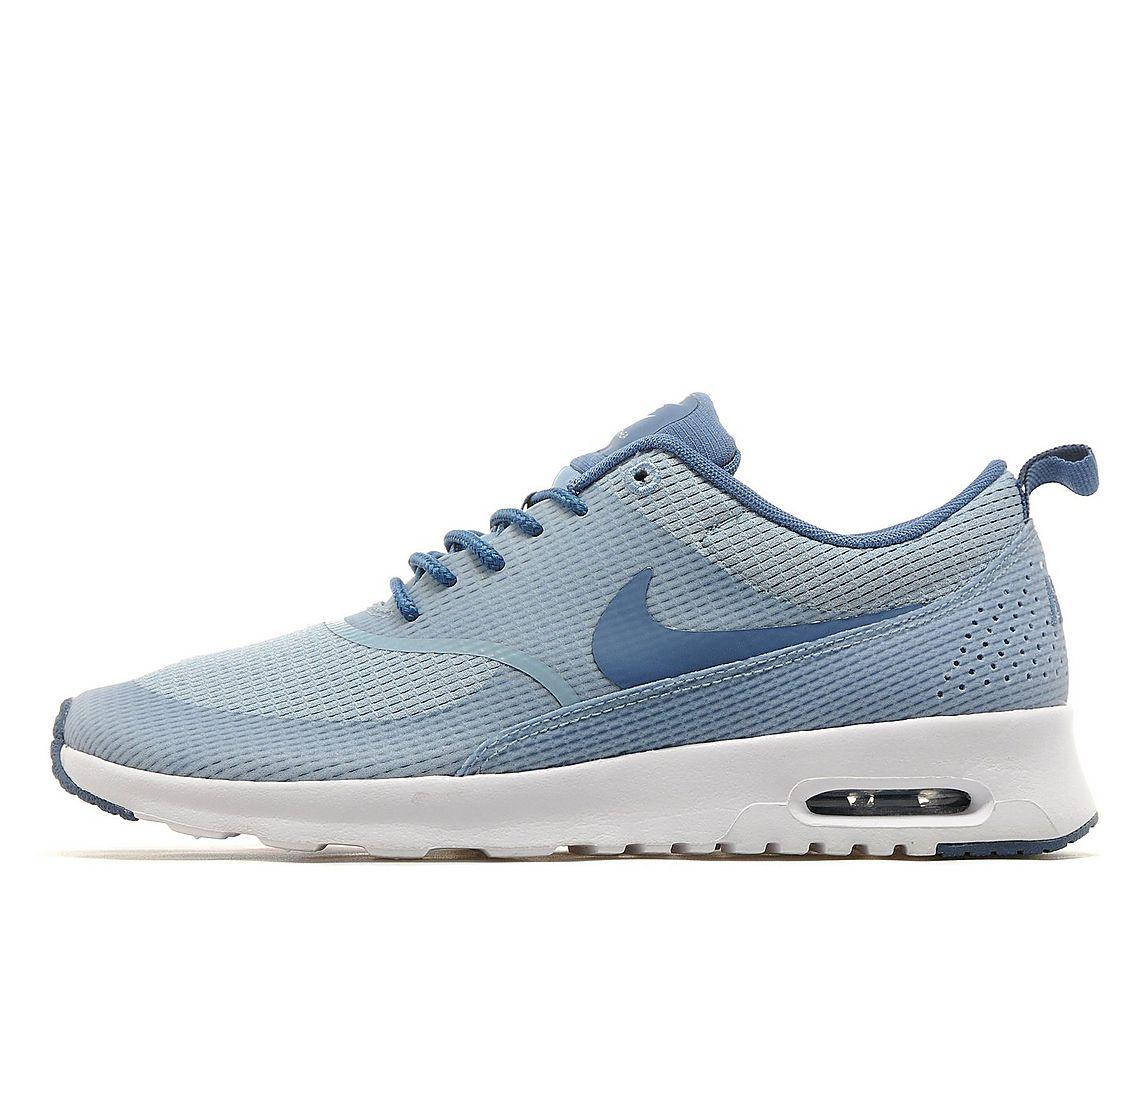 Nike Air Max 97 Jd Sports